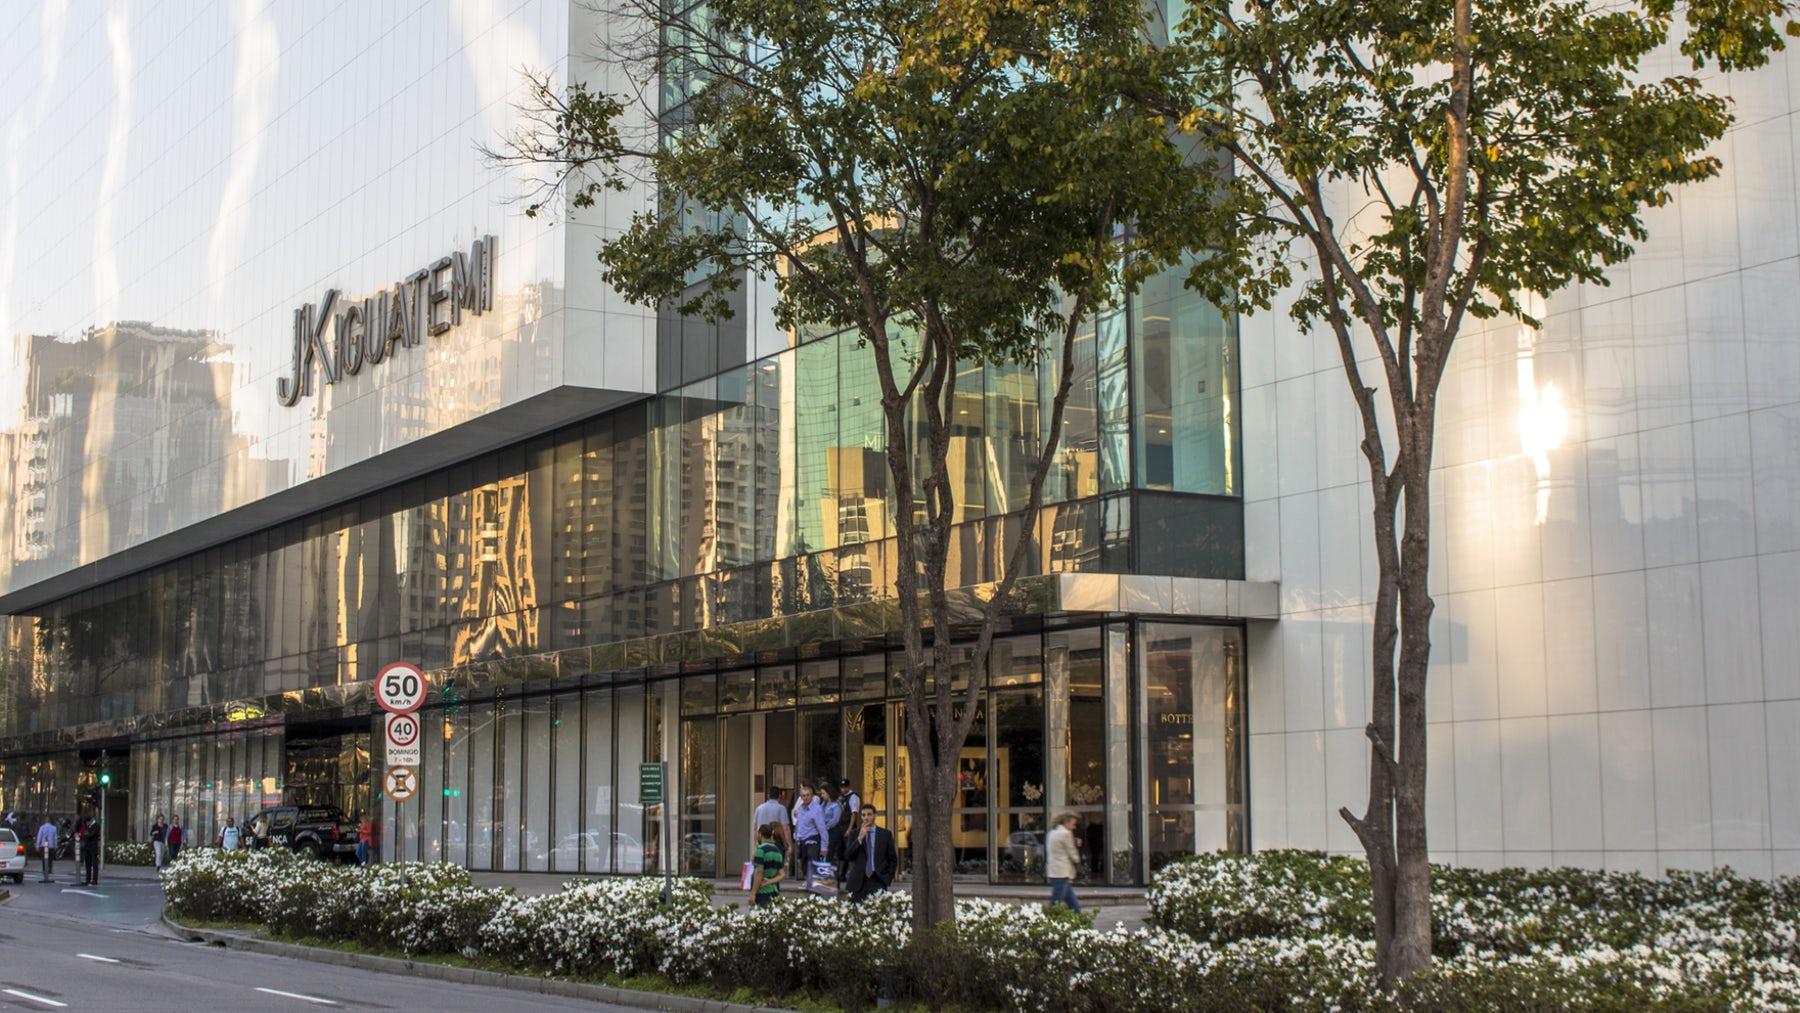 JK Iguatemi mall in São Paulo, Brazil | Source: Shutterstock